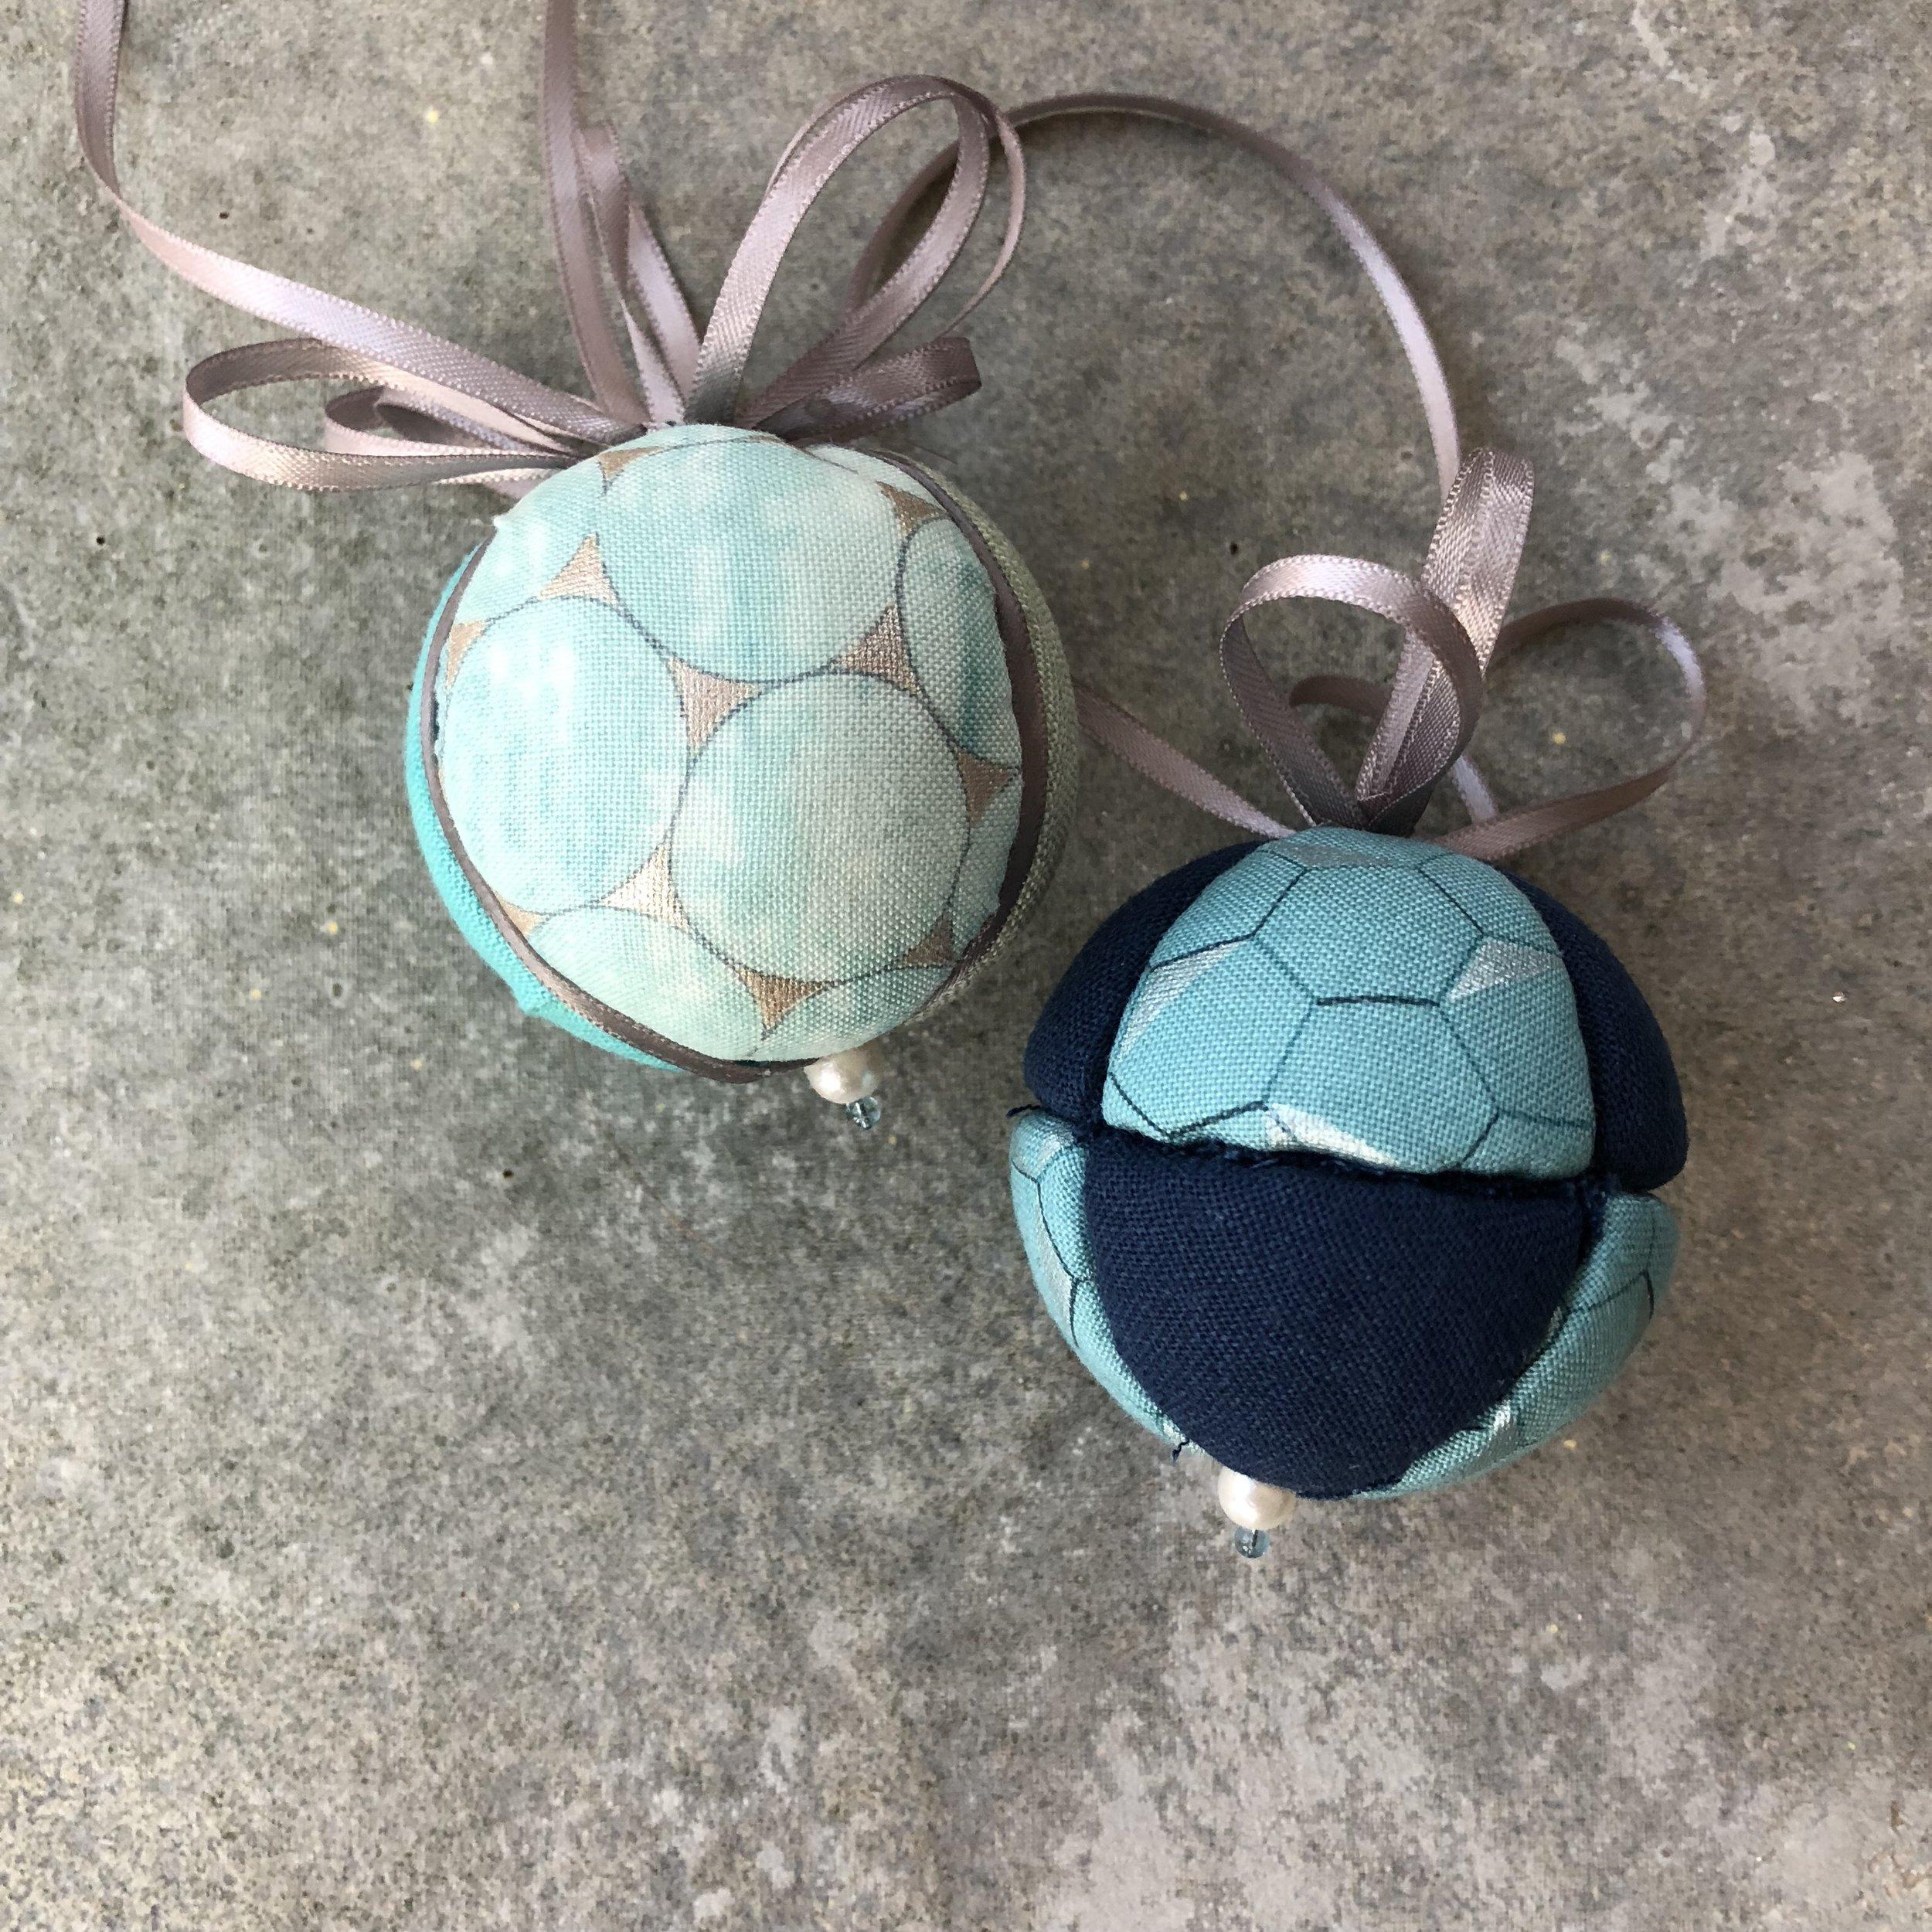 Kimekomi Ball Ornaments in Shimmer On and Essex Linen from Robert Kaufman Fabrics.